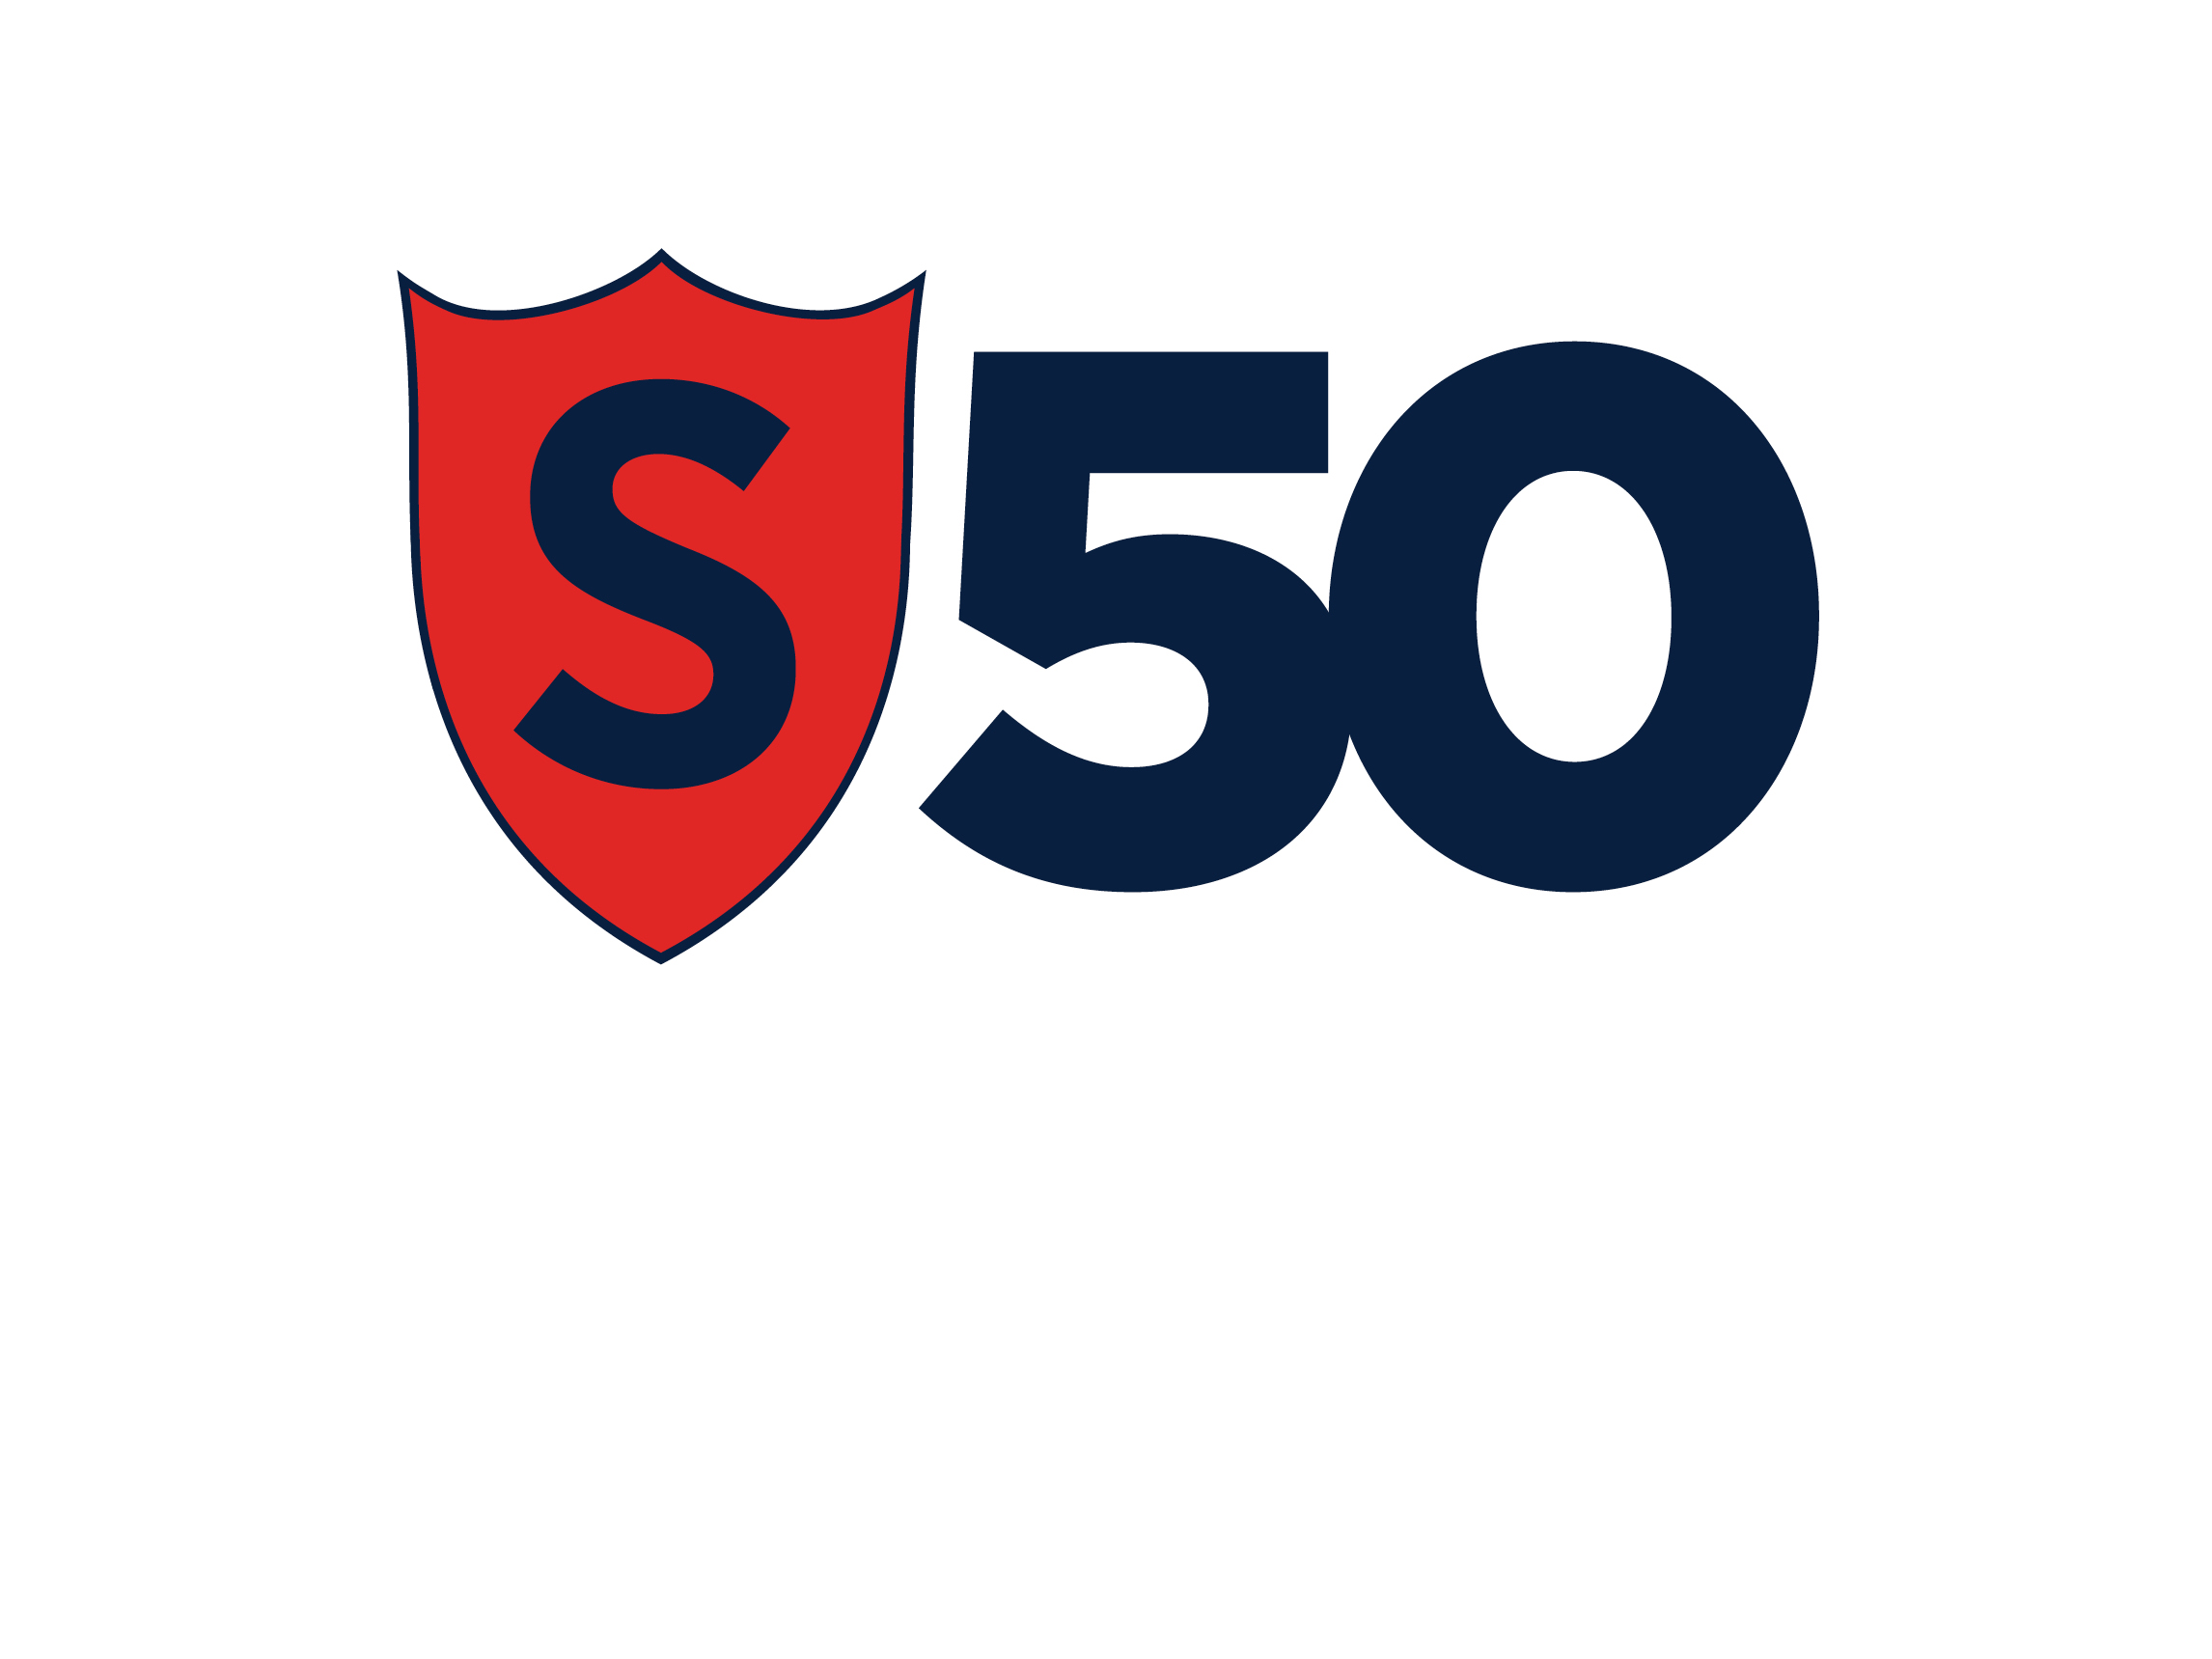 DMD_Logos_S50_150.jpg